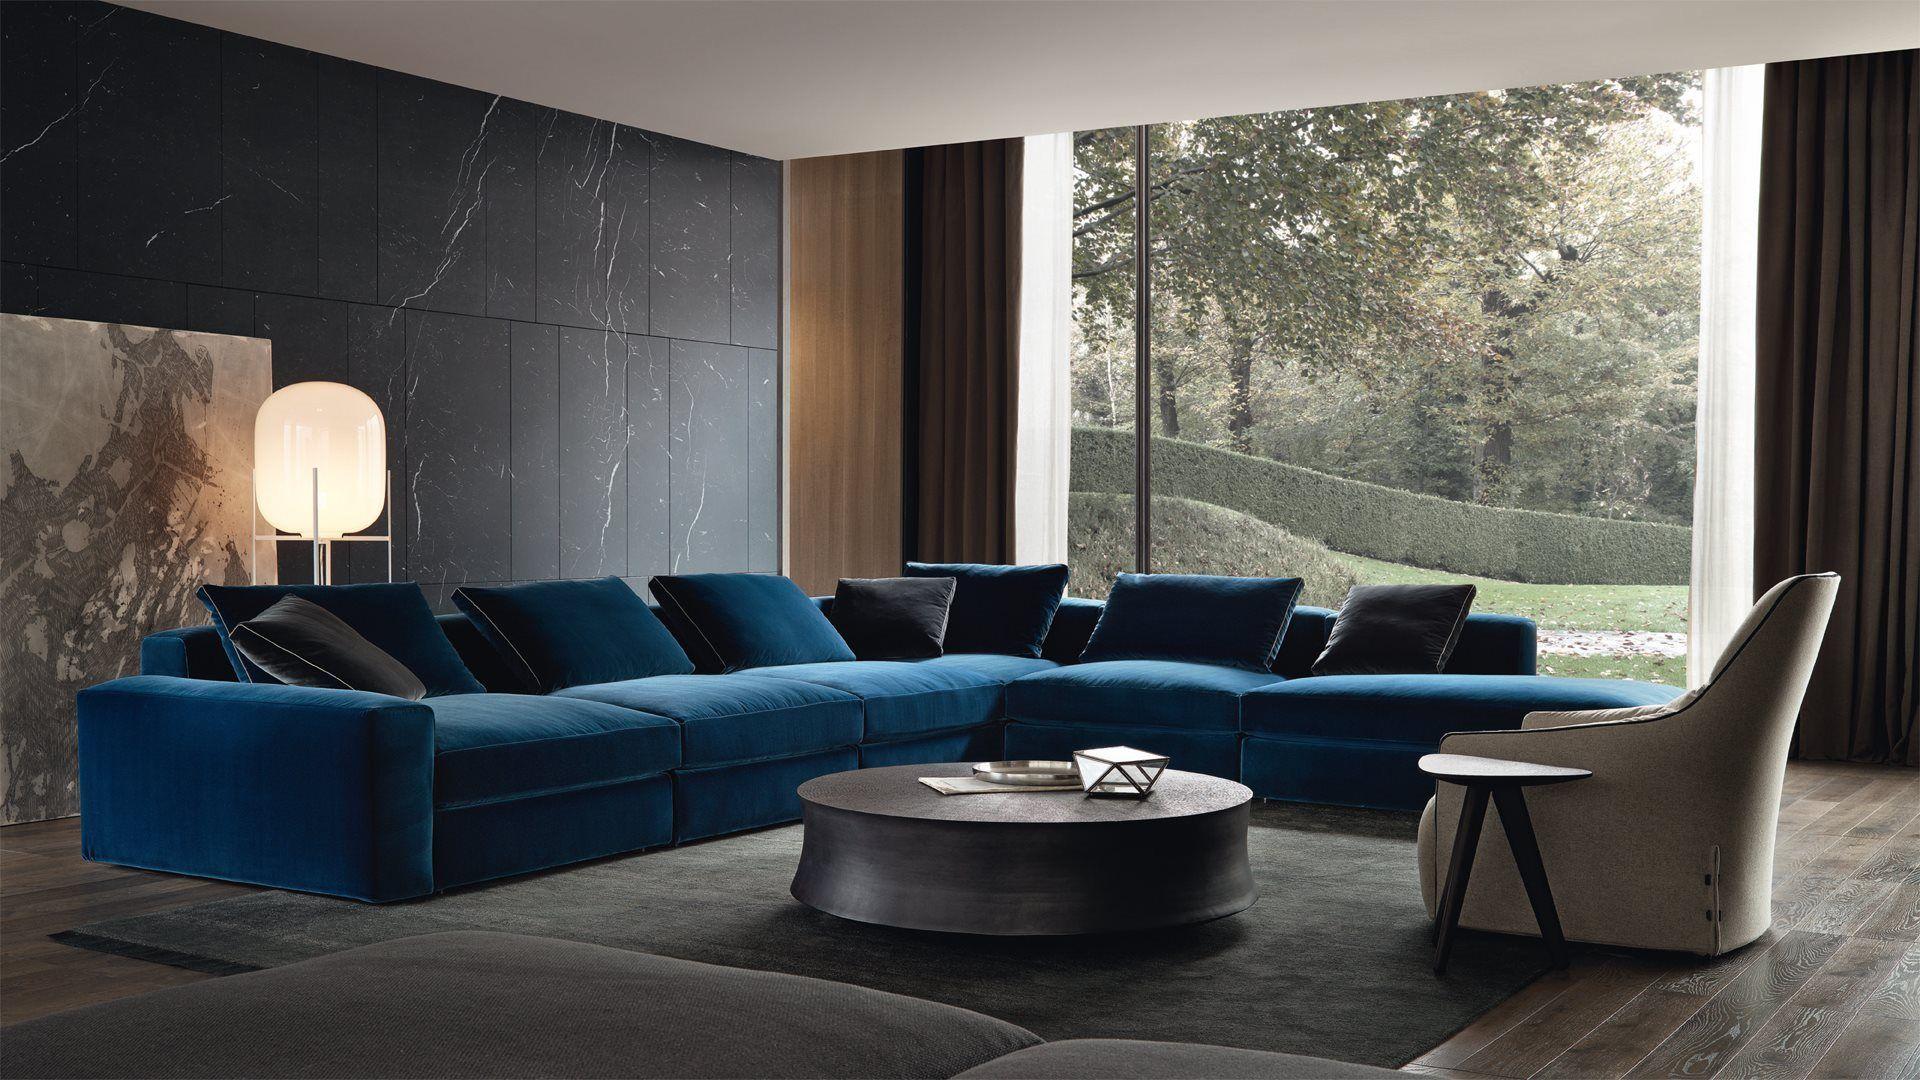 Poliform Furniture Design Living Room Apartment Interior Design Modern Contemporary Interior Design